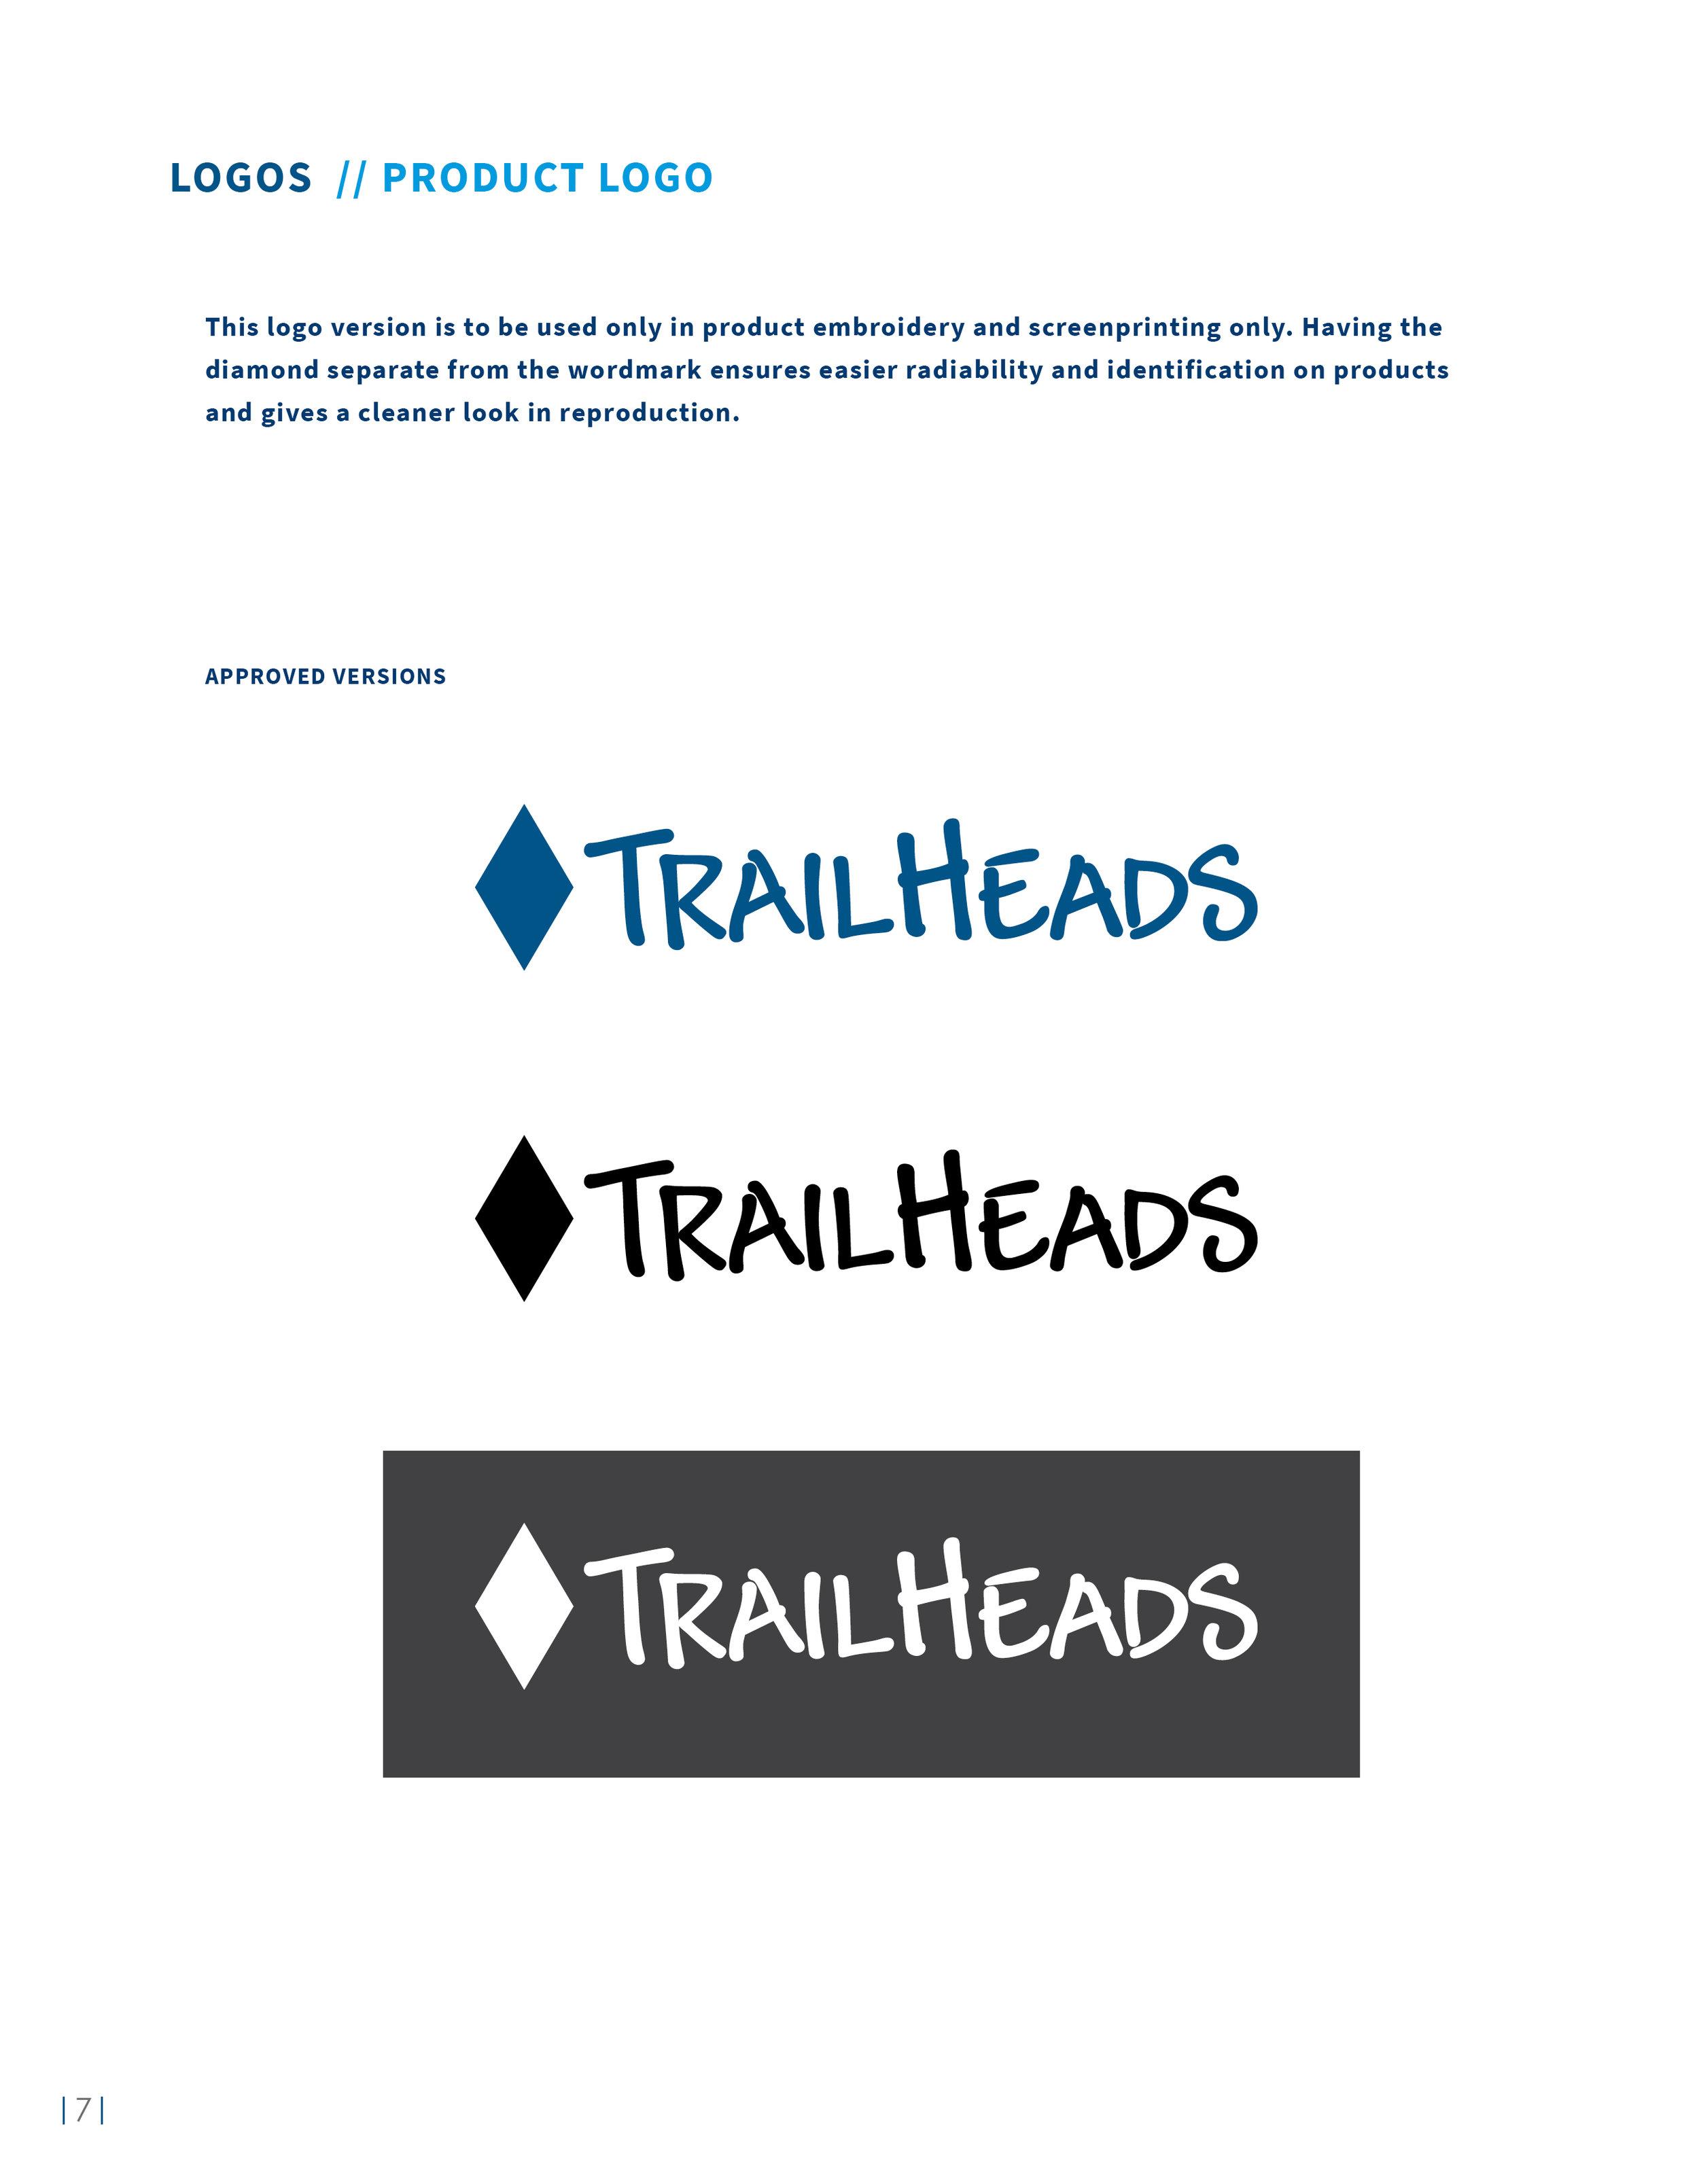 apparel-company-brand-guidelines-design-by-jordan-fretz-design-17.jpg